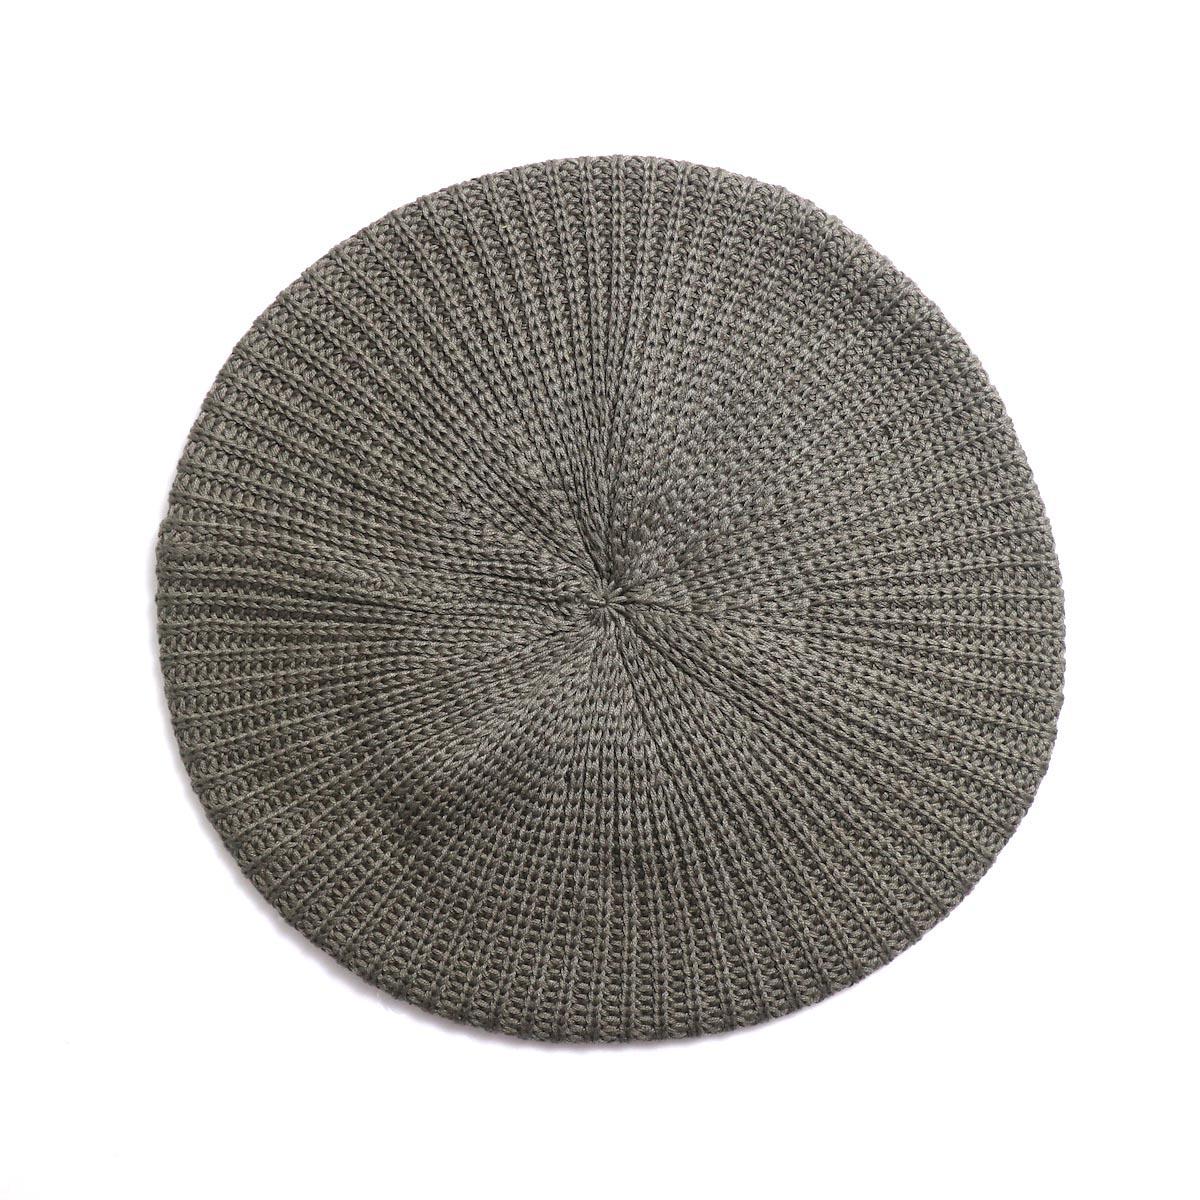 LEUCHTFEUER / BIG HOOGE -Cotton×Acrylic (Taupe)